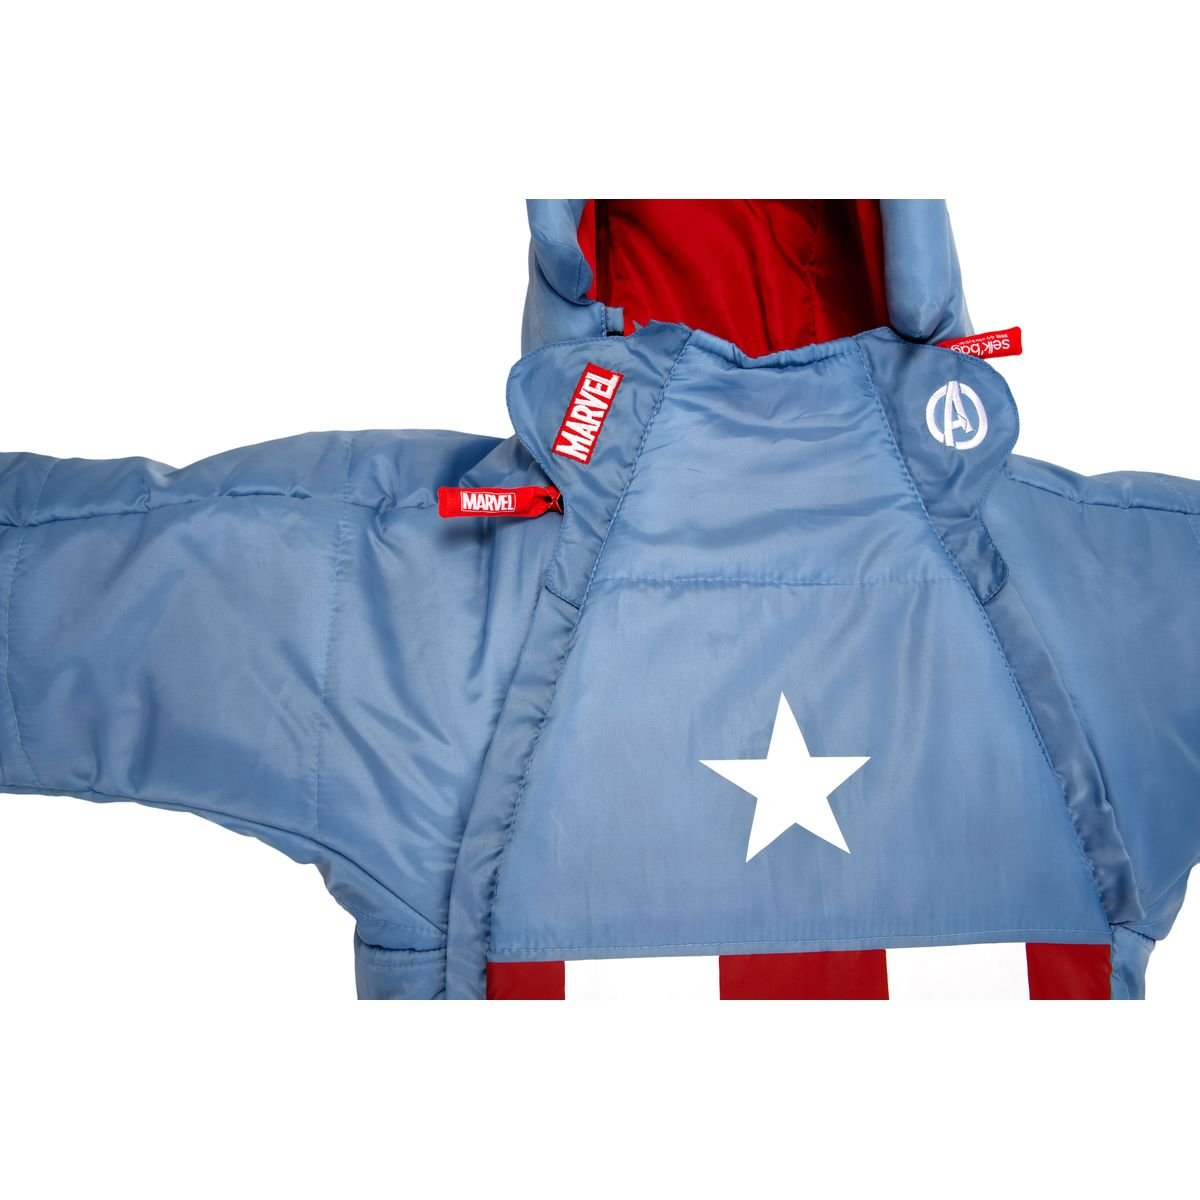 SELKBAG Saco de dormir Modelo KIDS CAPITÁN AMÉRICA,Talla S: Amazon.es: Deportes y aire libre